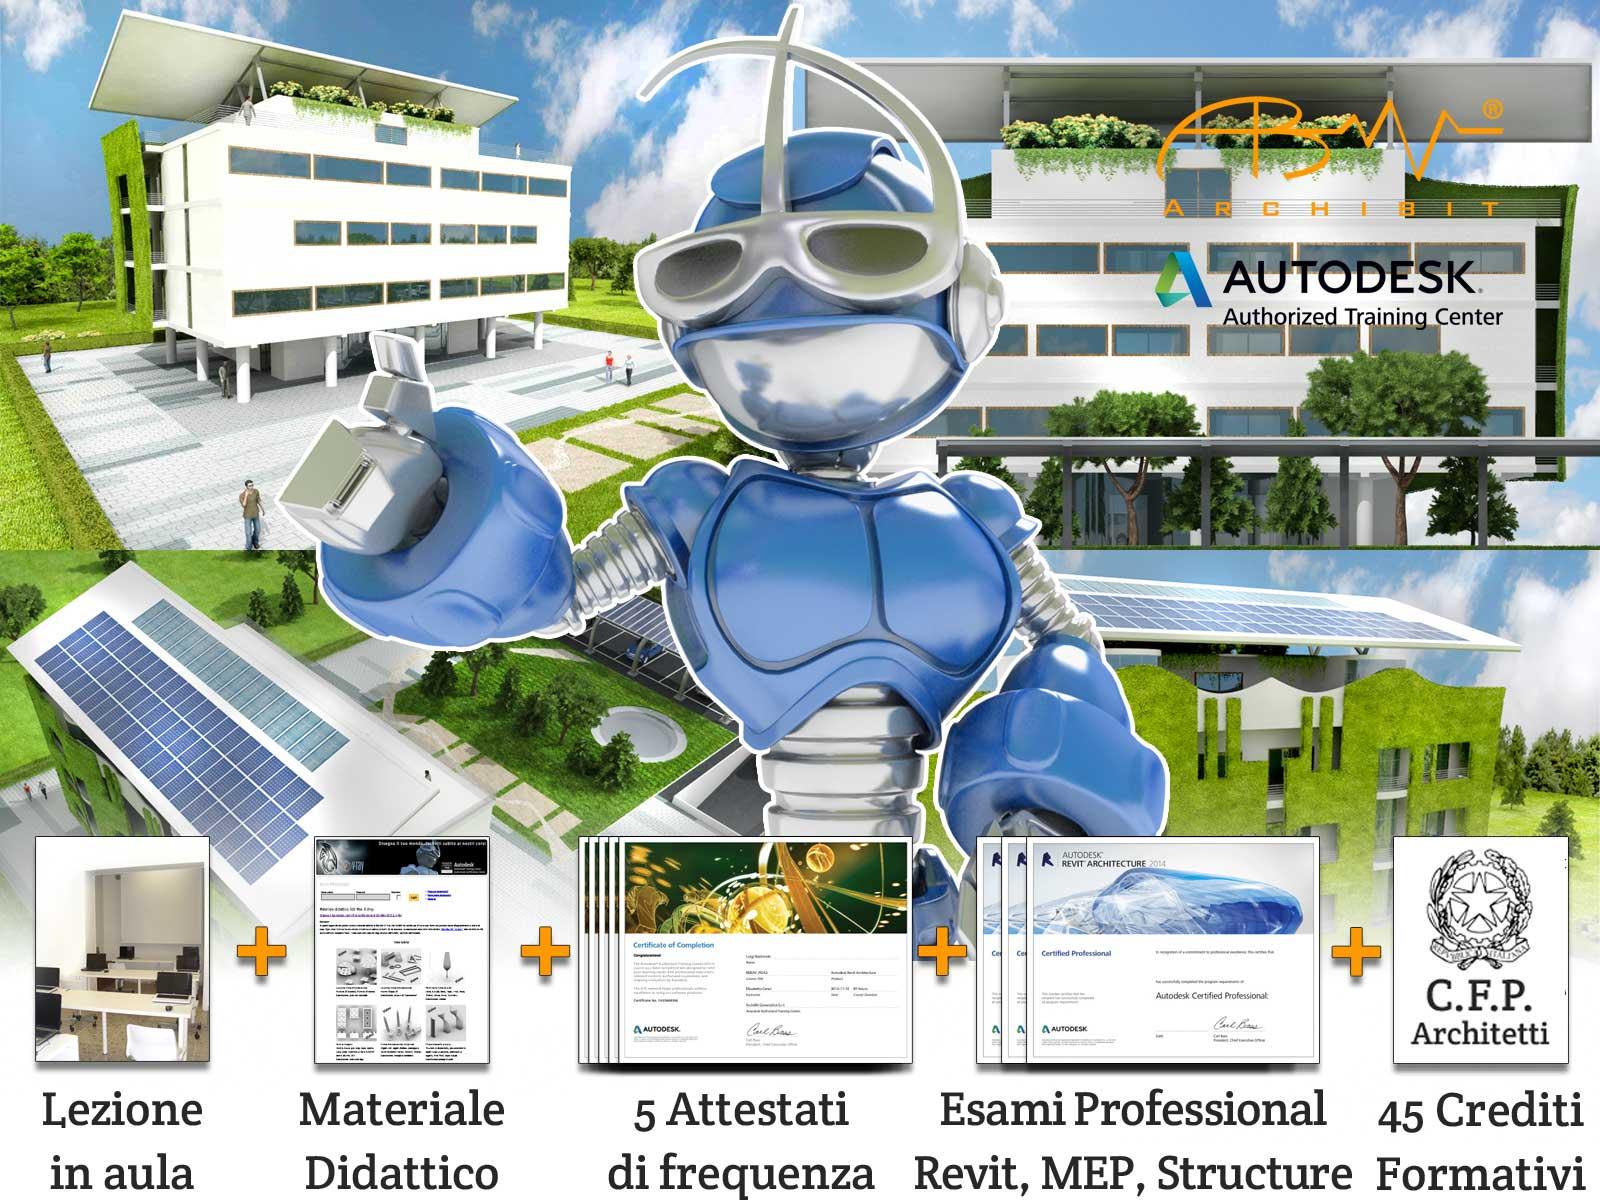 Corso Master Revit BIM Manager - Archibit Generation centro corsi Autodesk Roma - Revit Architecture Revit MEP revit Structure Navisworks